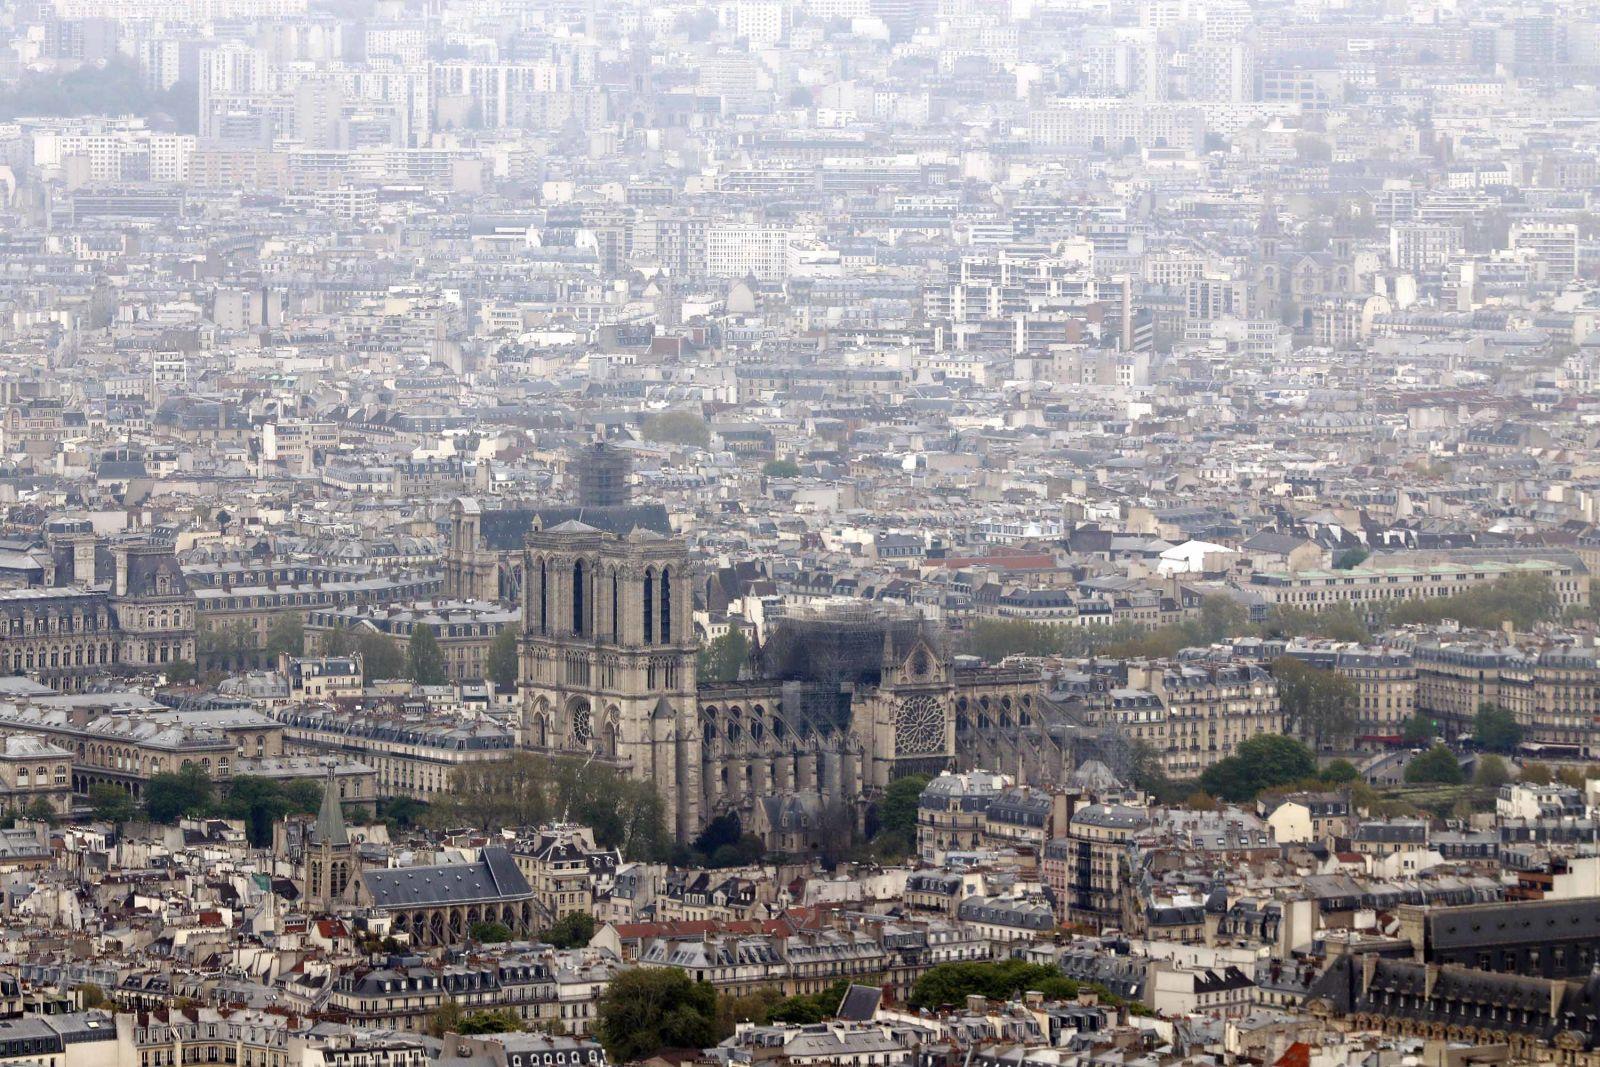 notre-dame katedrali yangını söndürüldü mü https://huglero.com